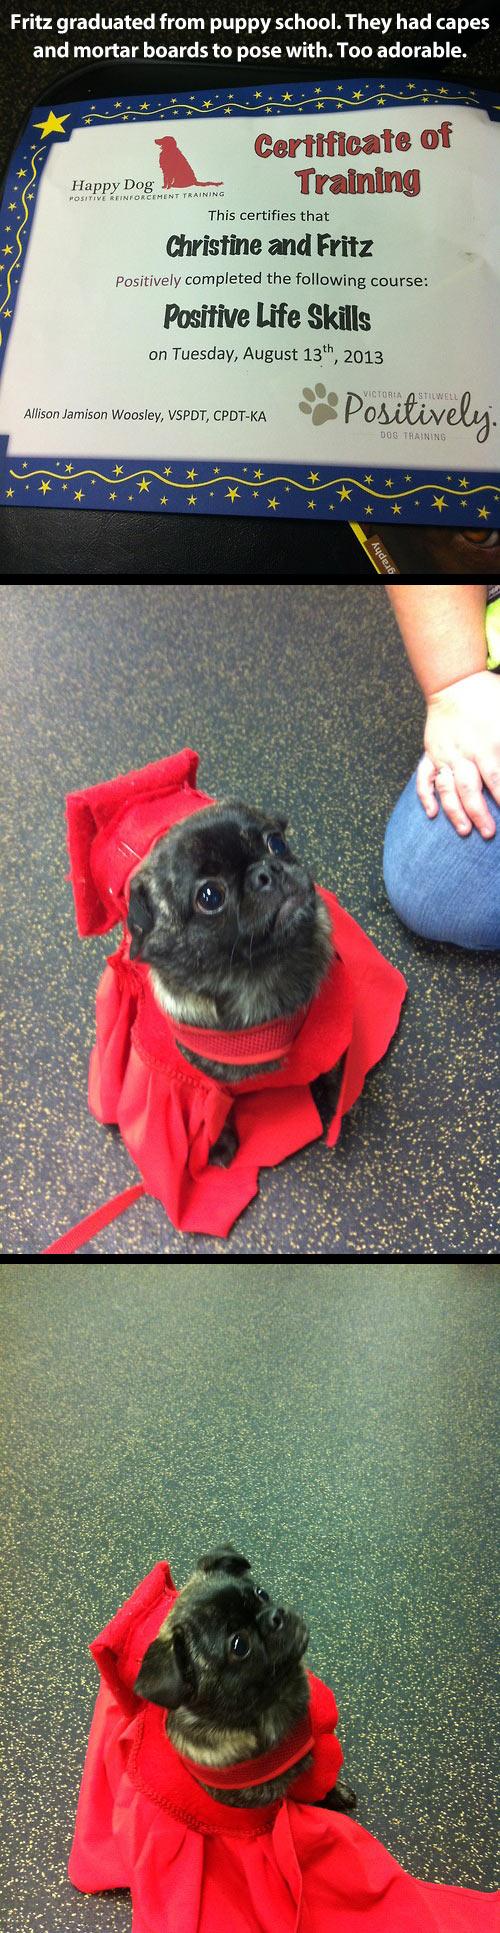 funny-certificate-training-dog-graduation